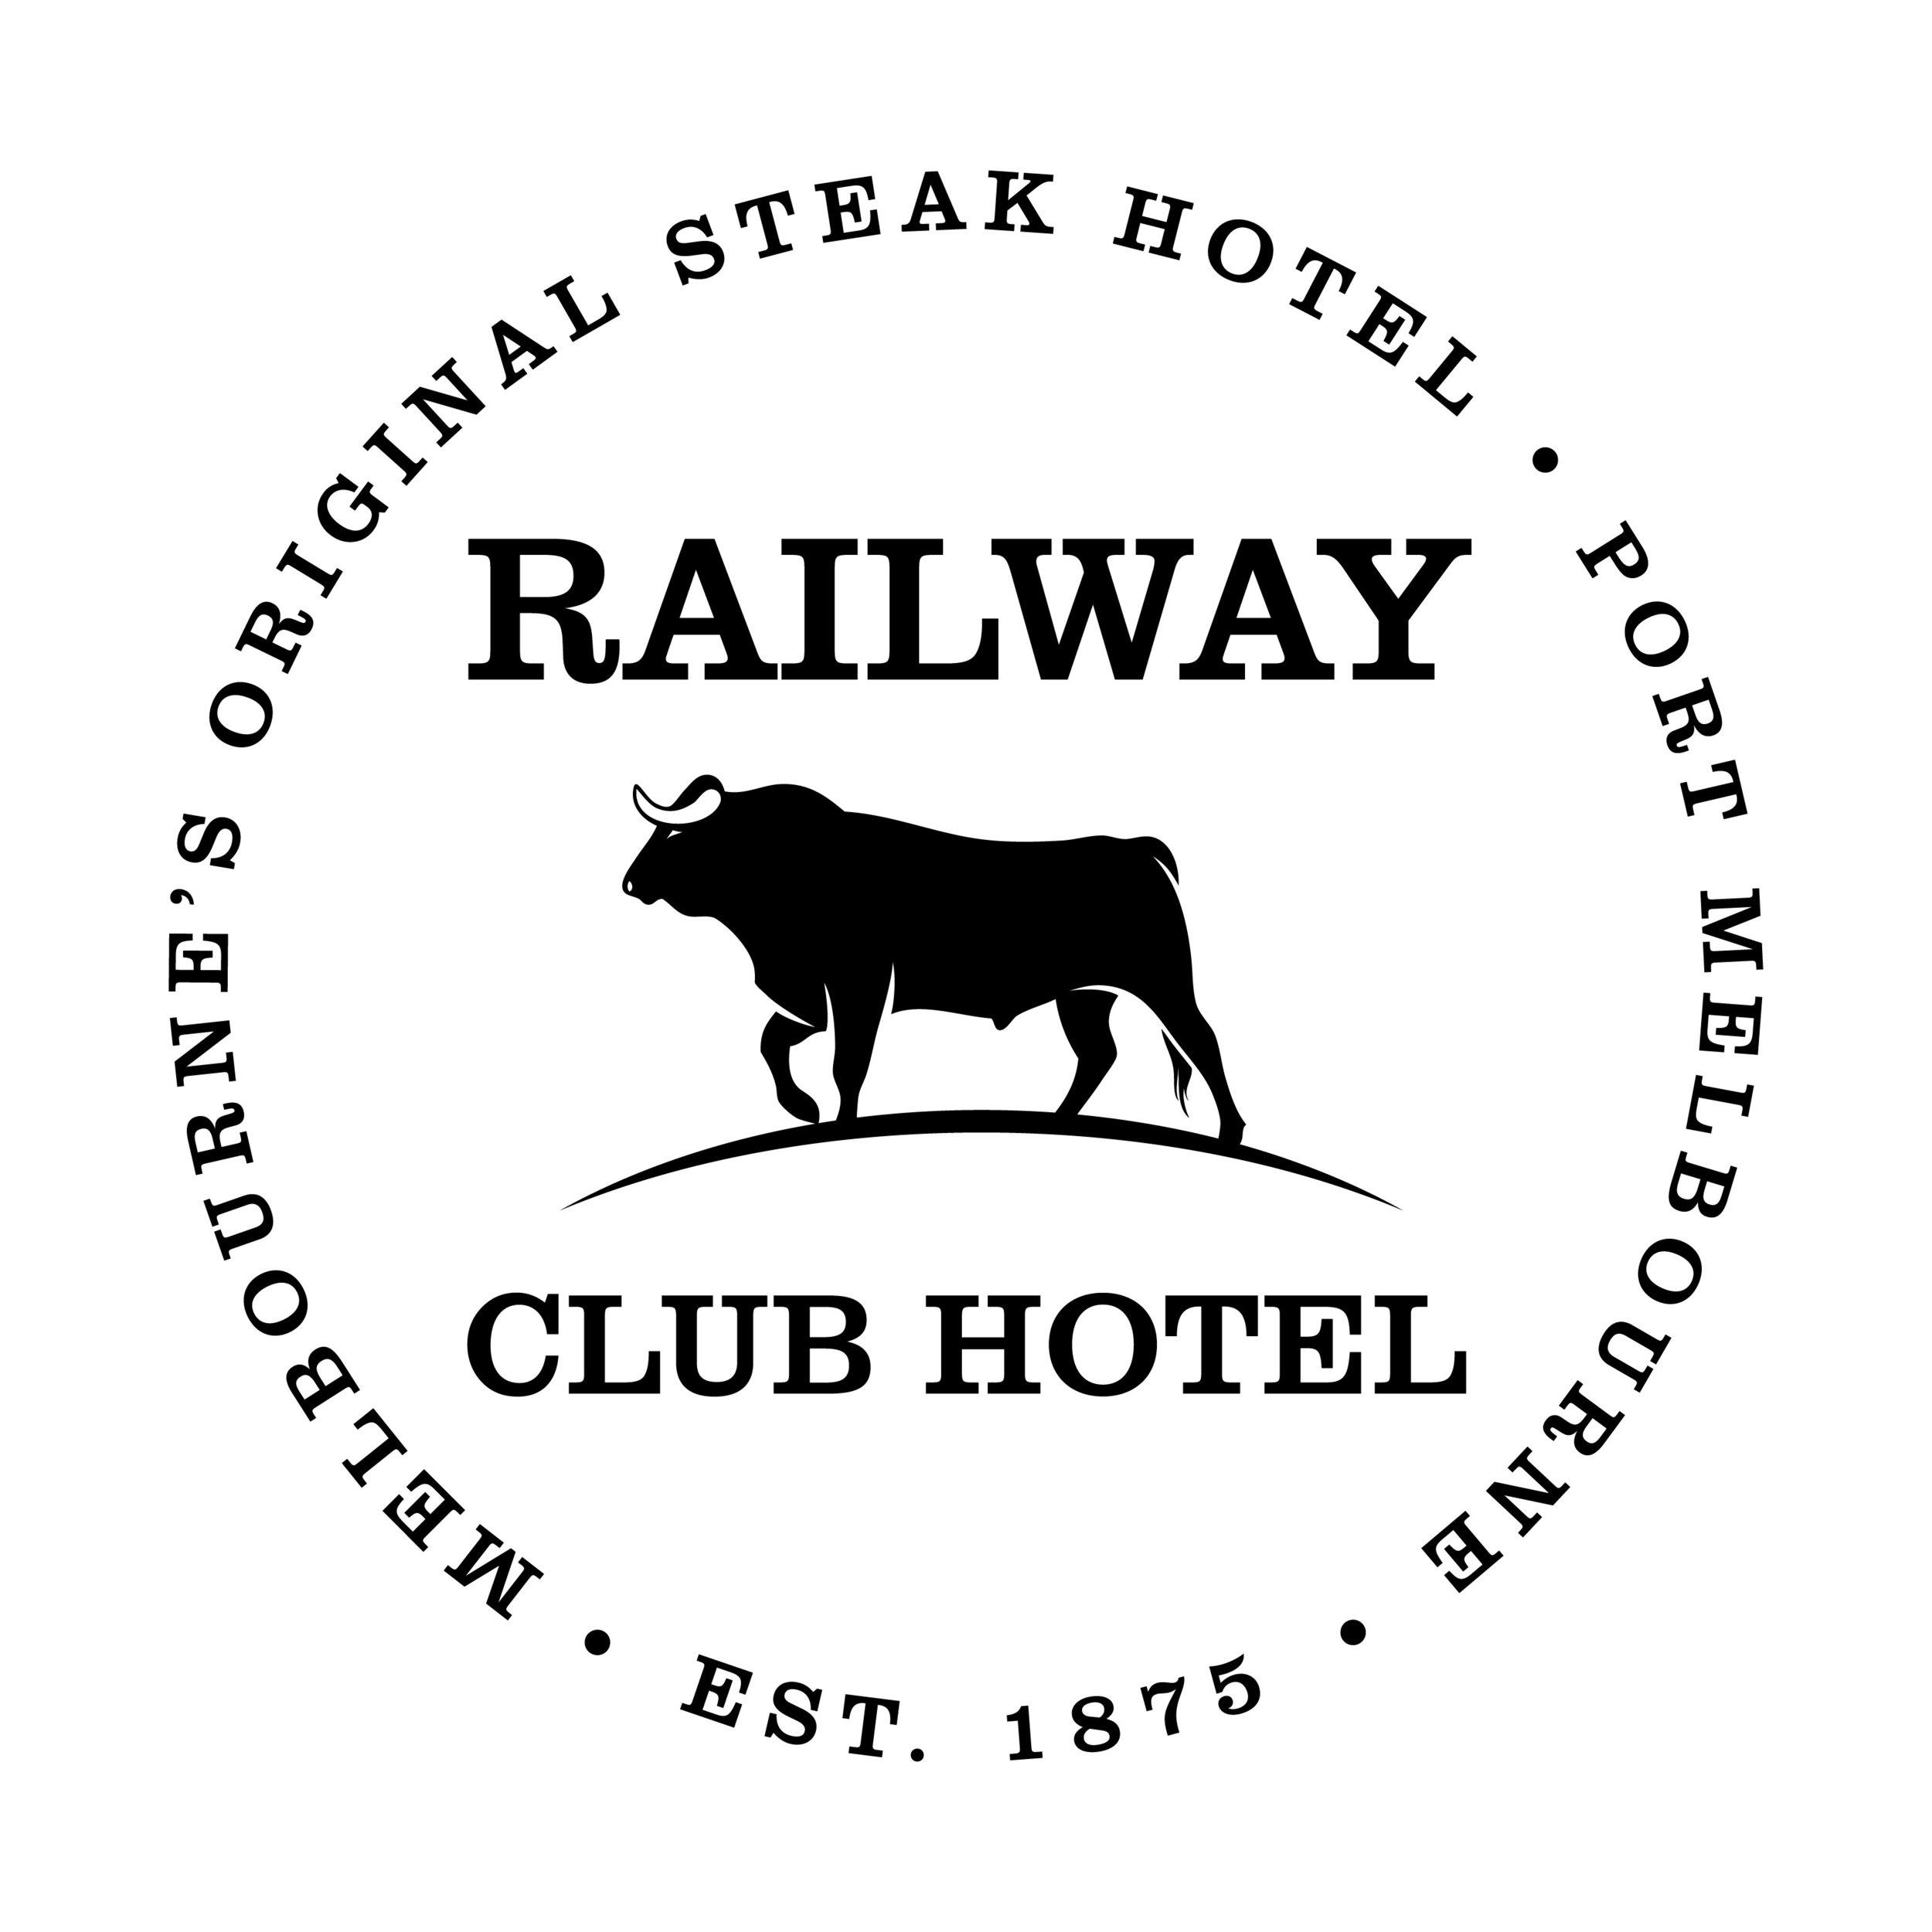 Railway Hotel.jpg